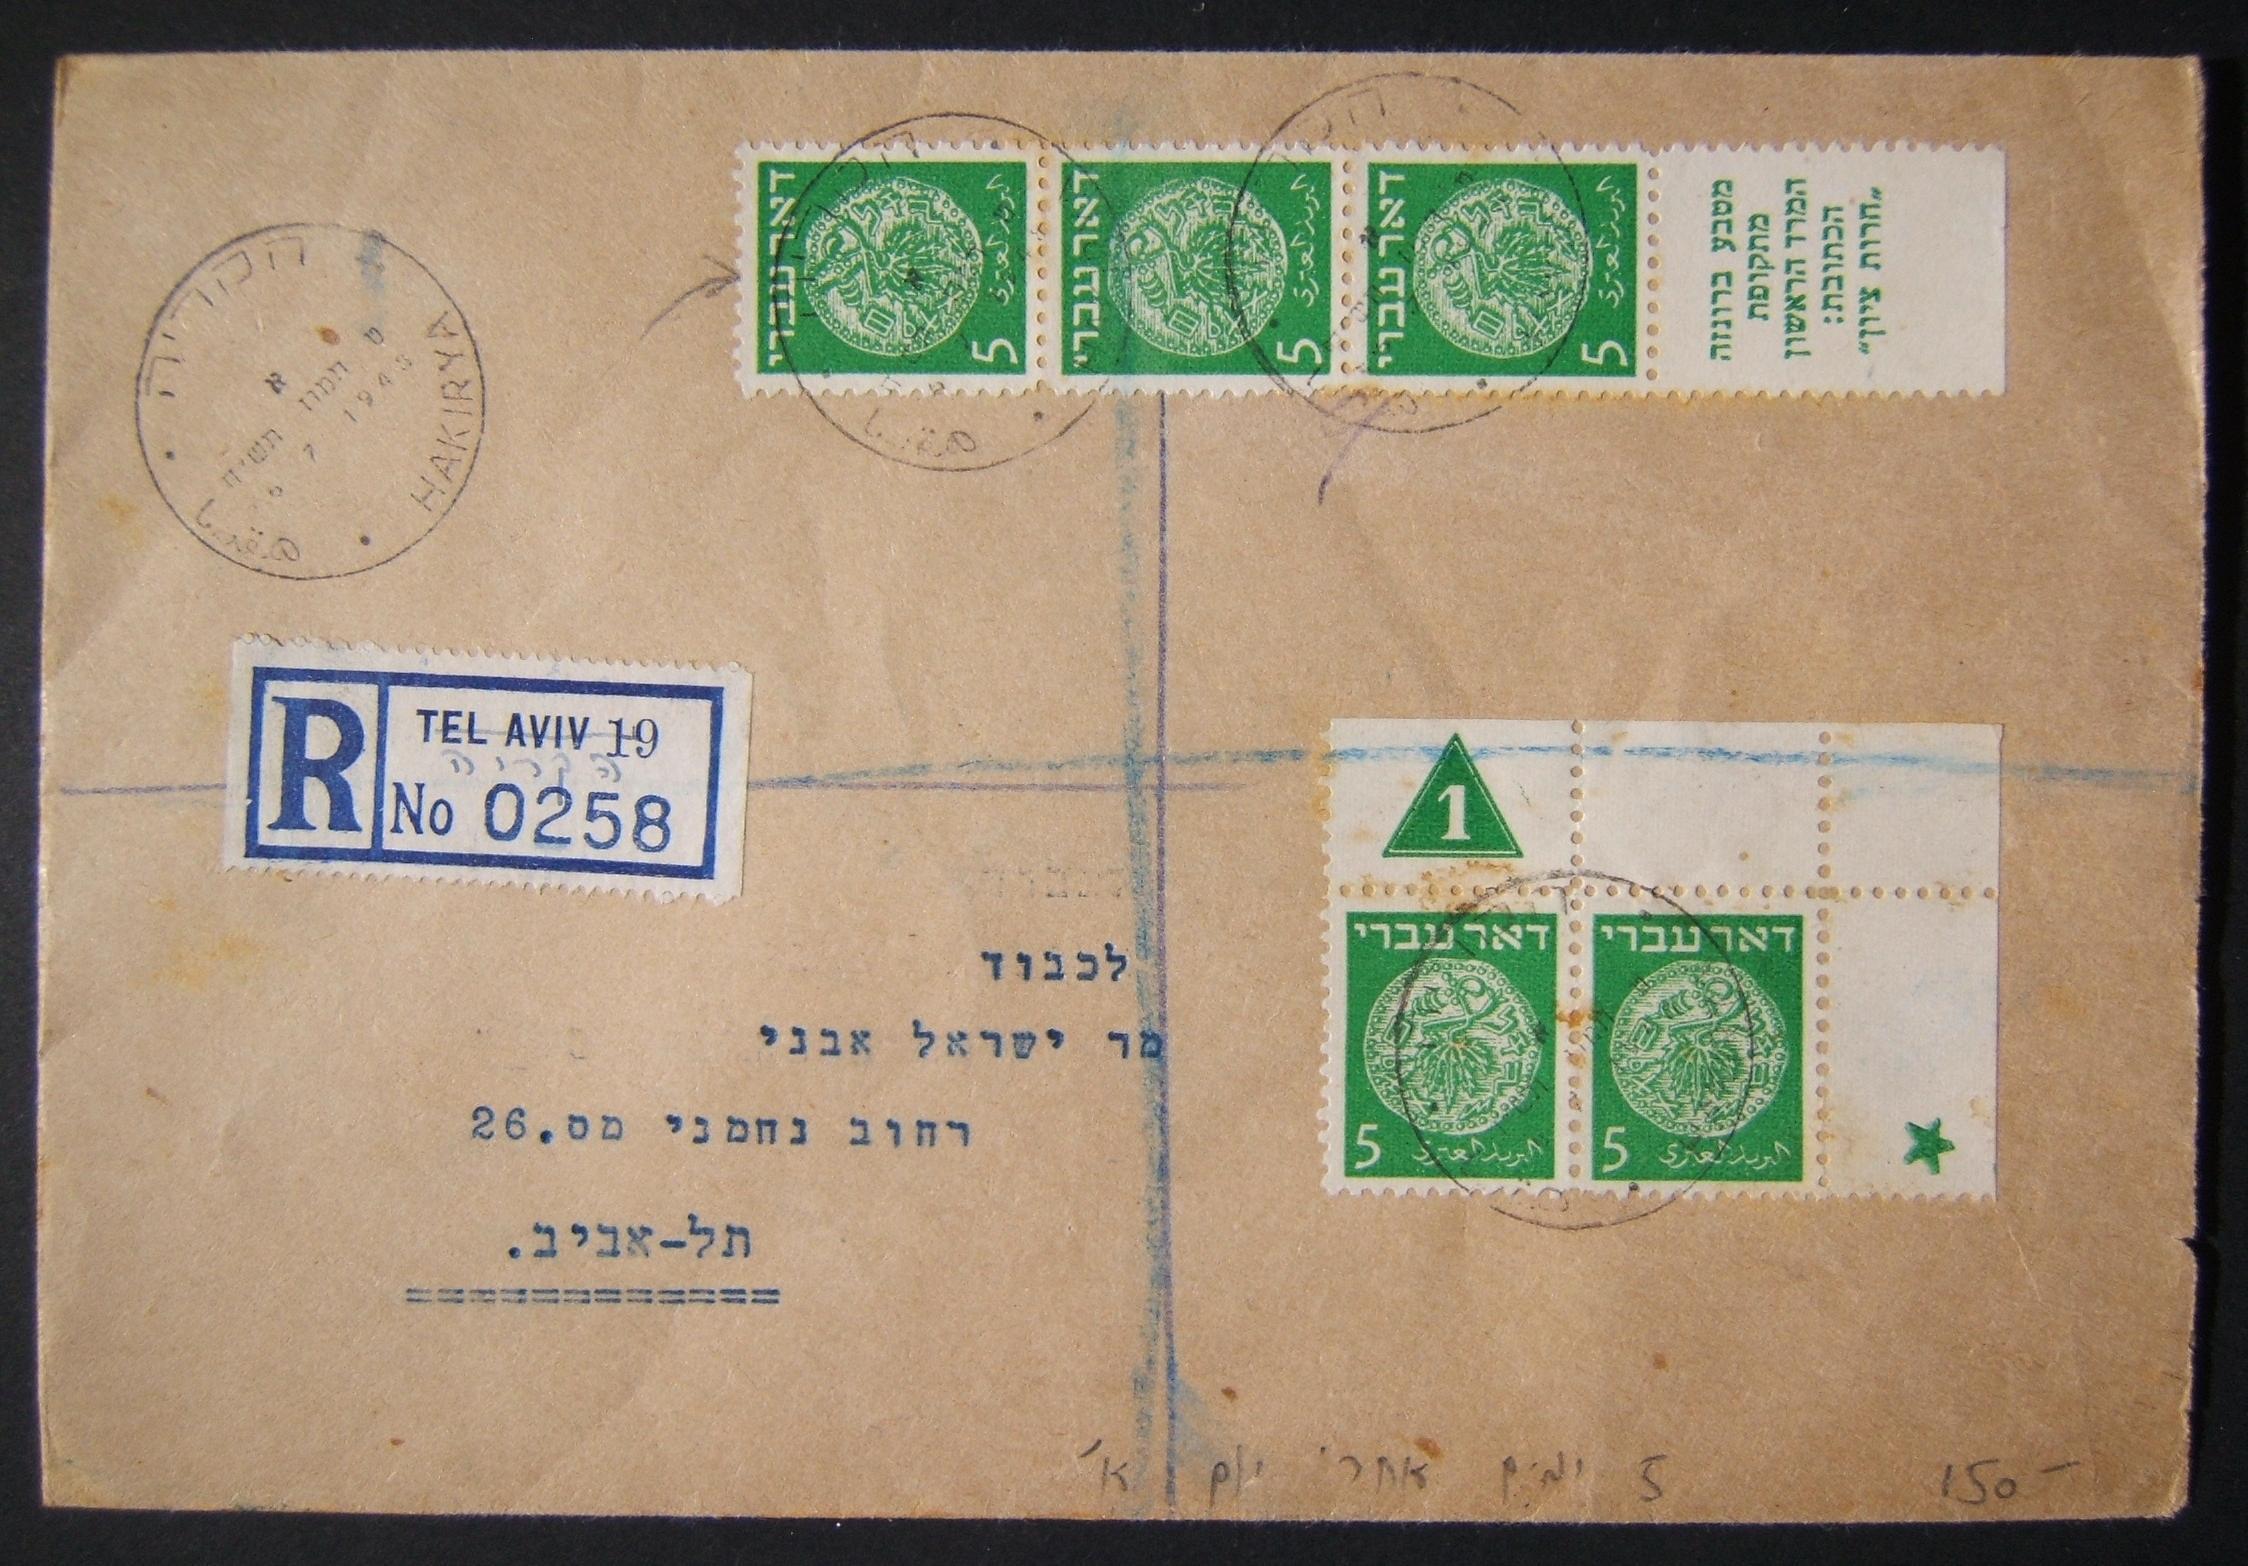 16-7-1948 local Tel Aviv mail with rare Doar Ivri plate block franking